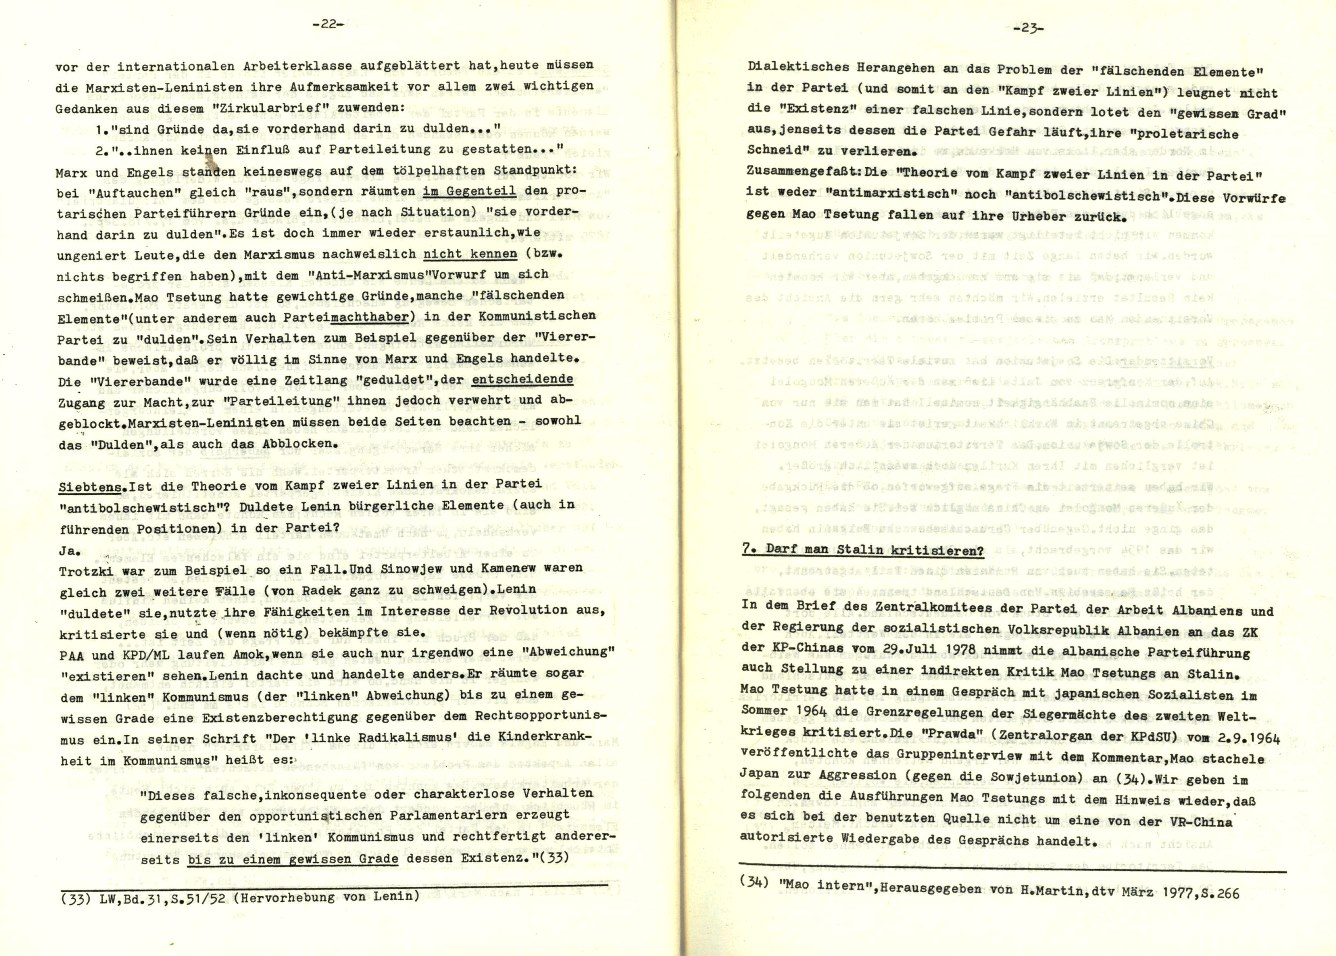 Muenchen_Kampf_dem_Revisionismus_1978_08_12